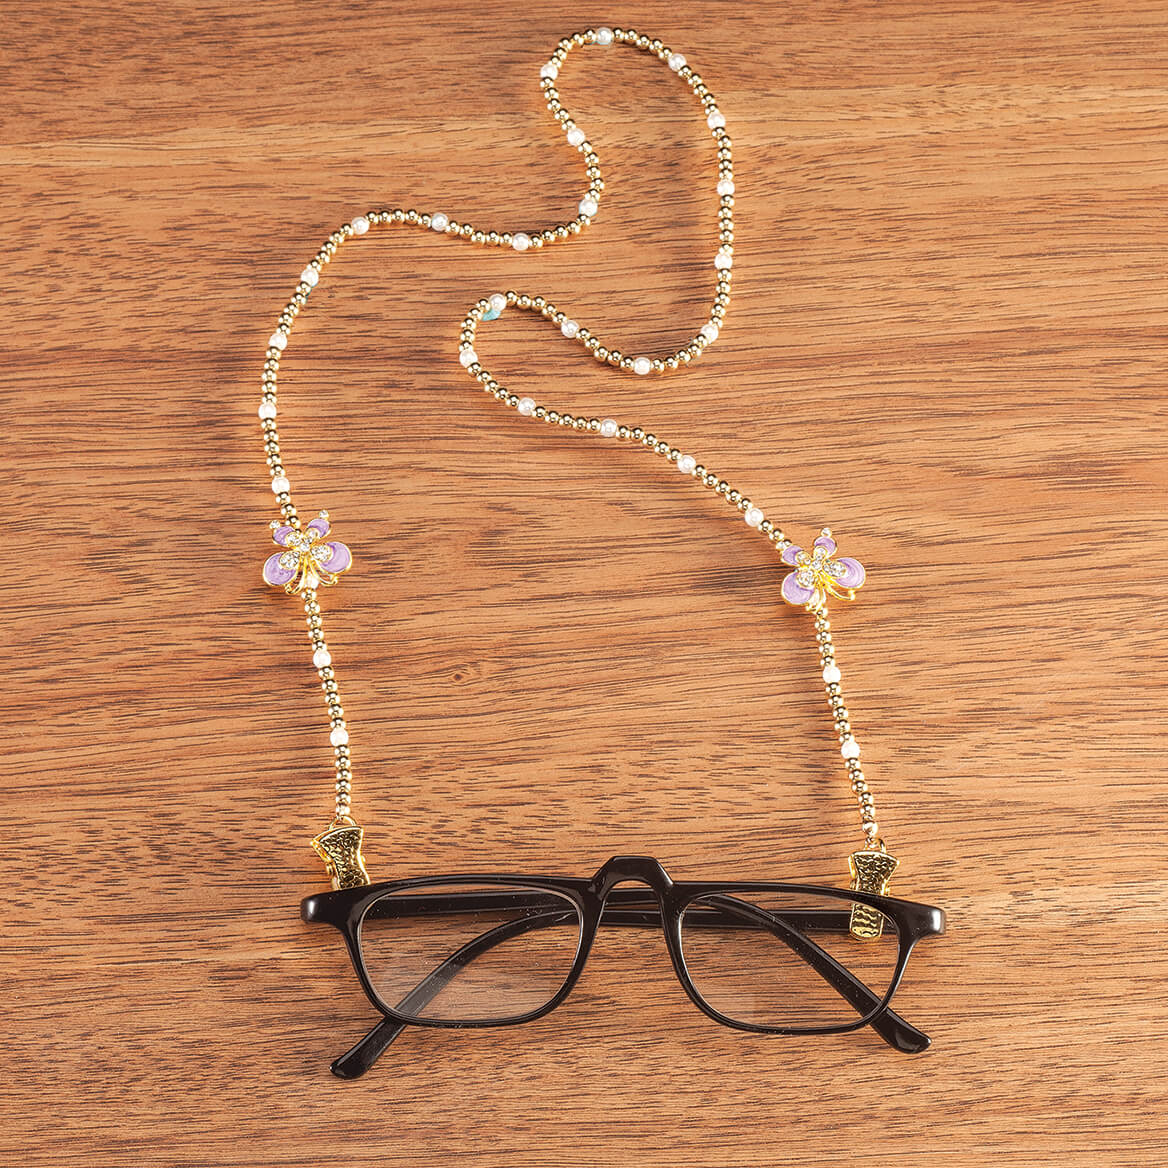 378f5dd00efb Beaded Eyeglass Chain - Eyeglass Chain Necklace - Miles Kimball